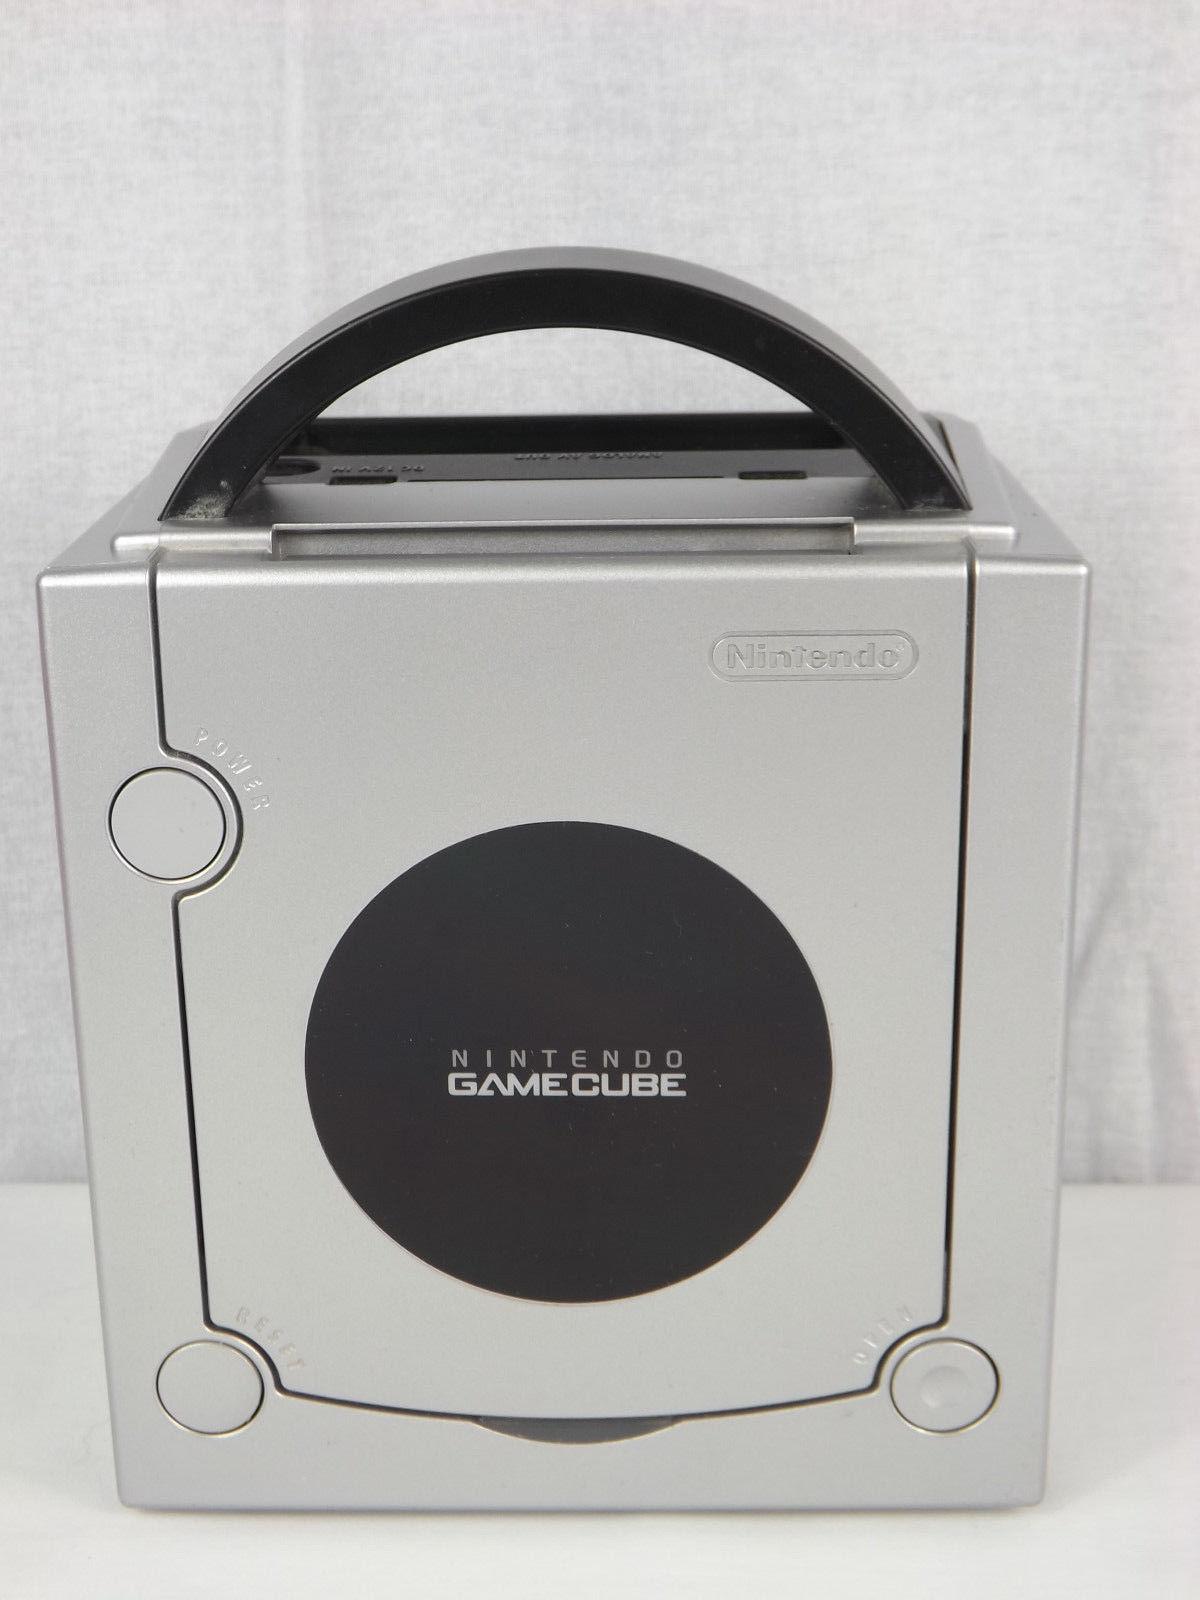 Nintendo GameCube Console Black + Mario Party 4 Game + 2 Controllers + Cords